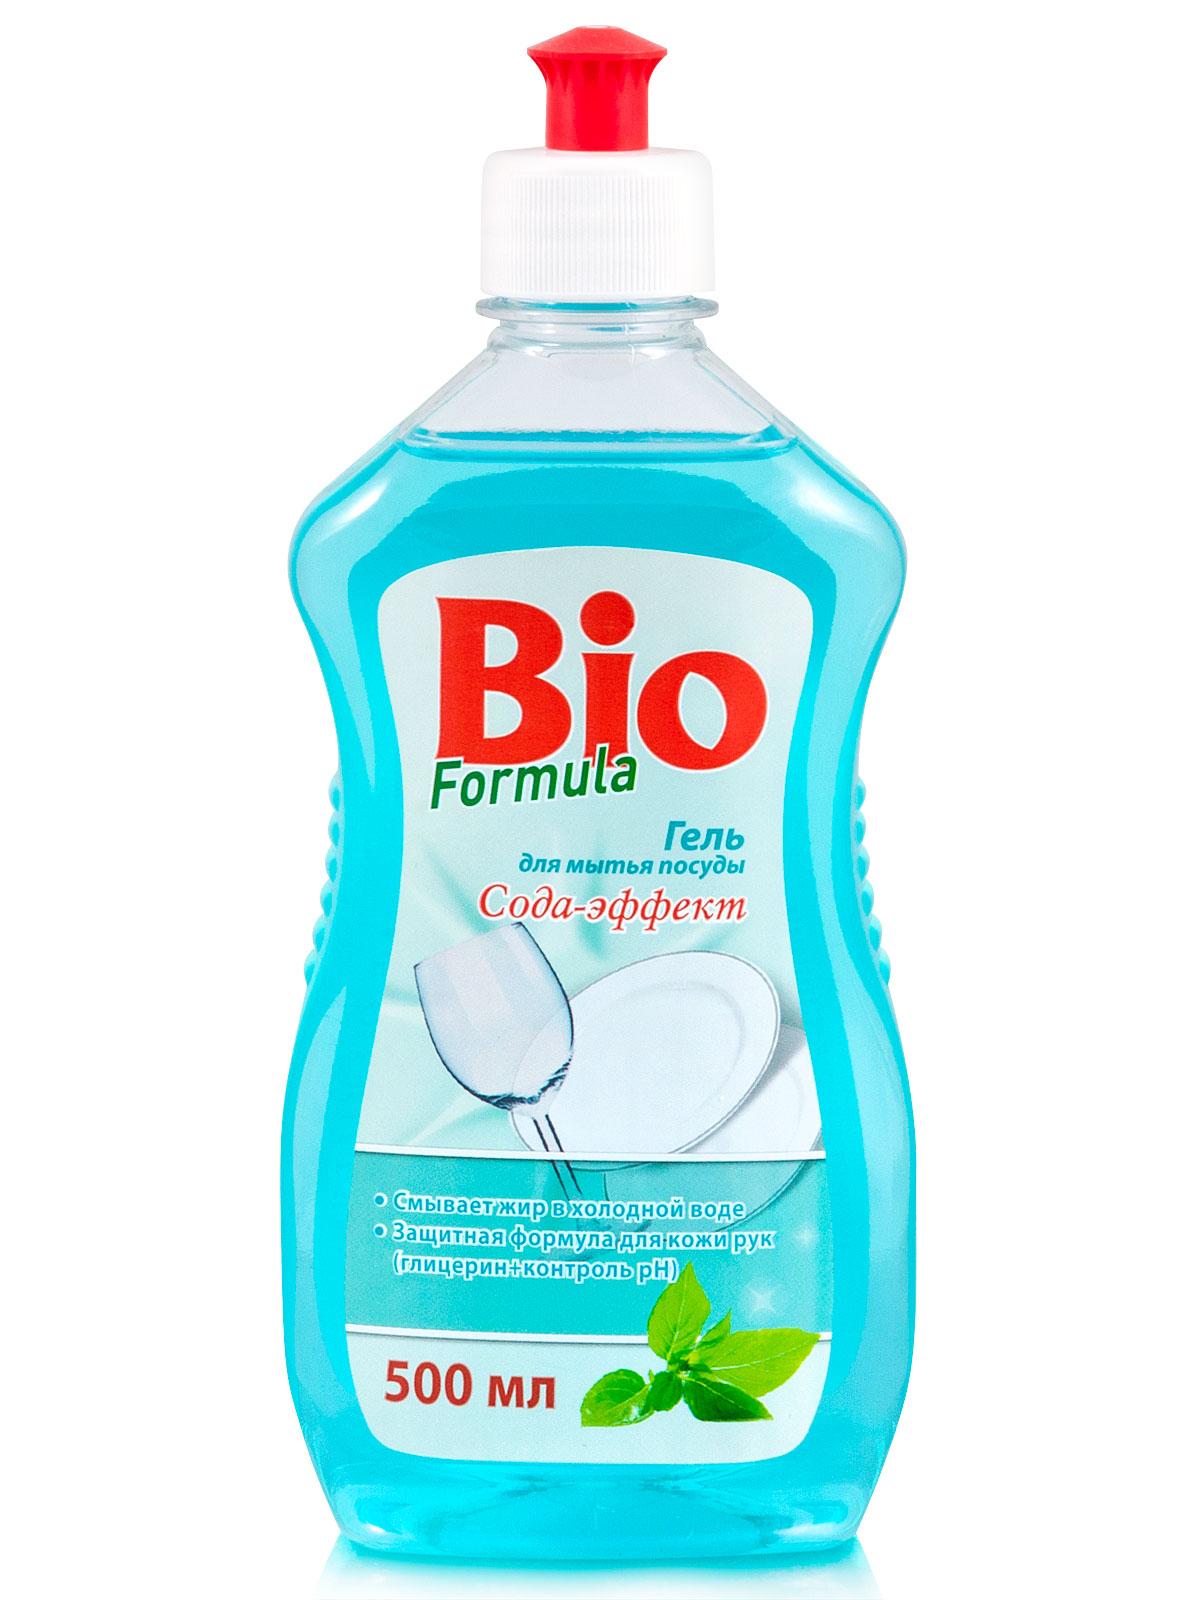 bio BIO Formula Сода эффект 500мл (4823015922718)